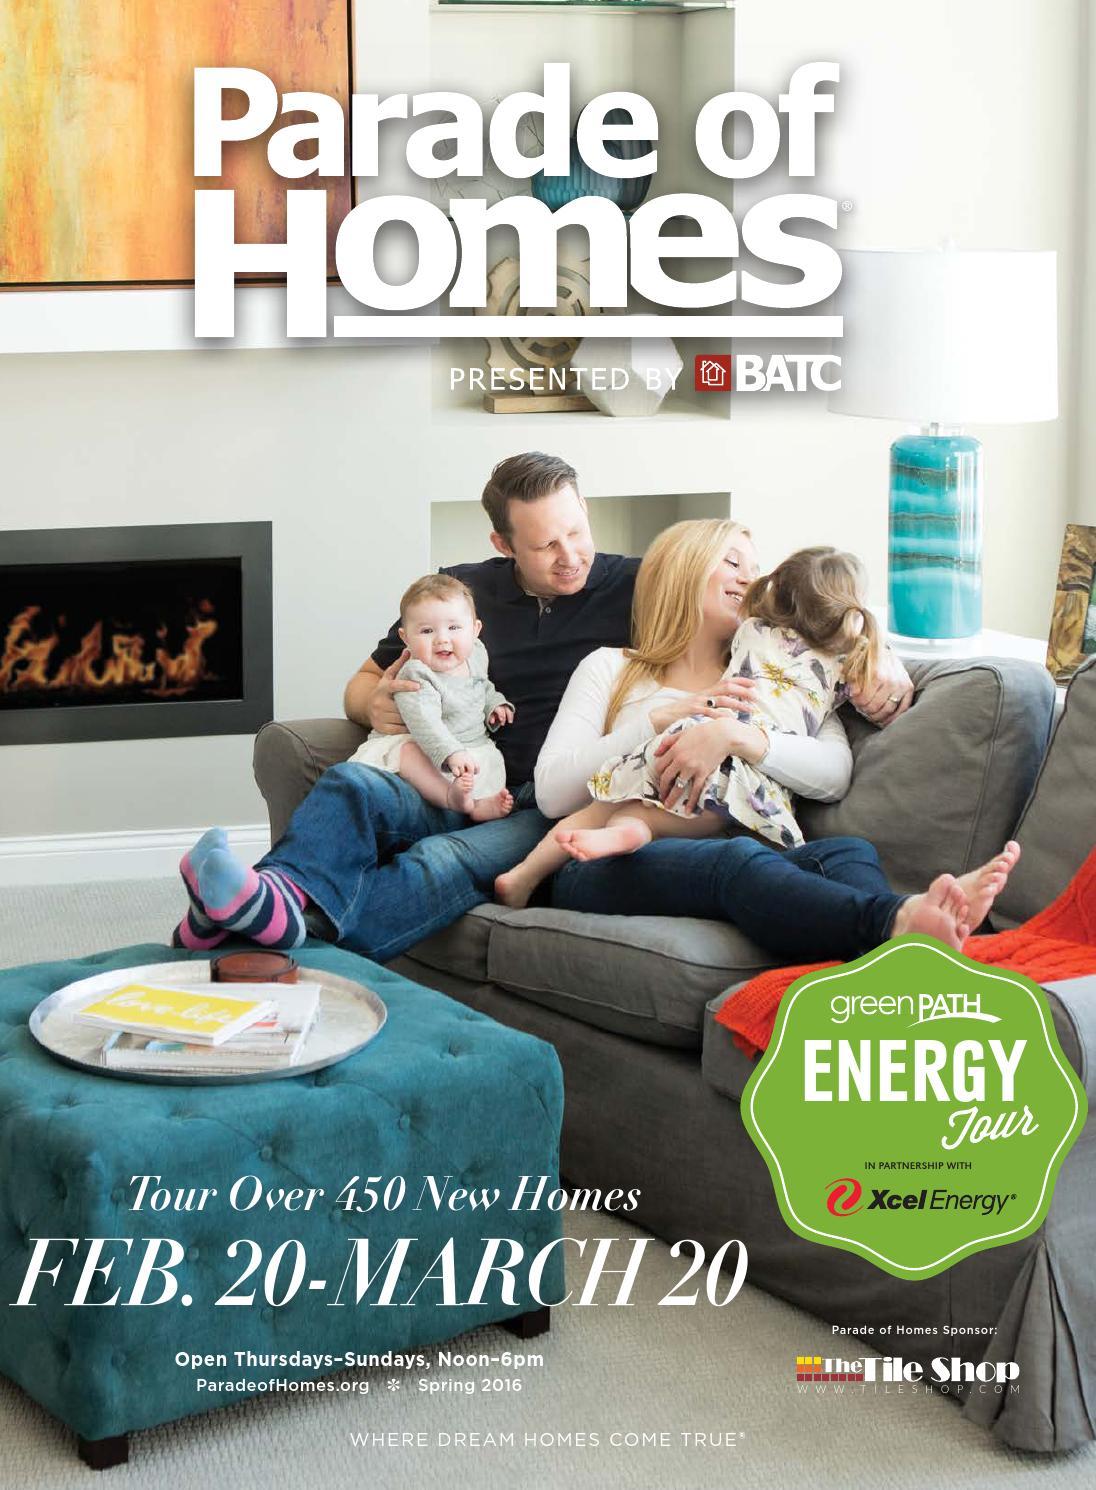 mccar homes hanley floor plan house design plans